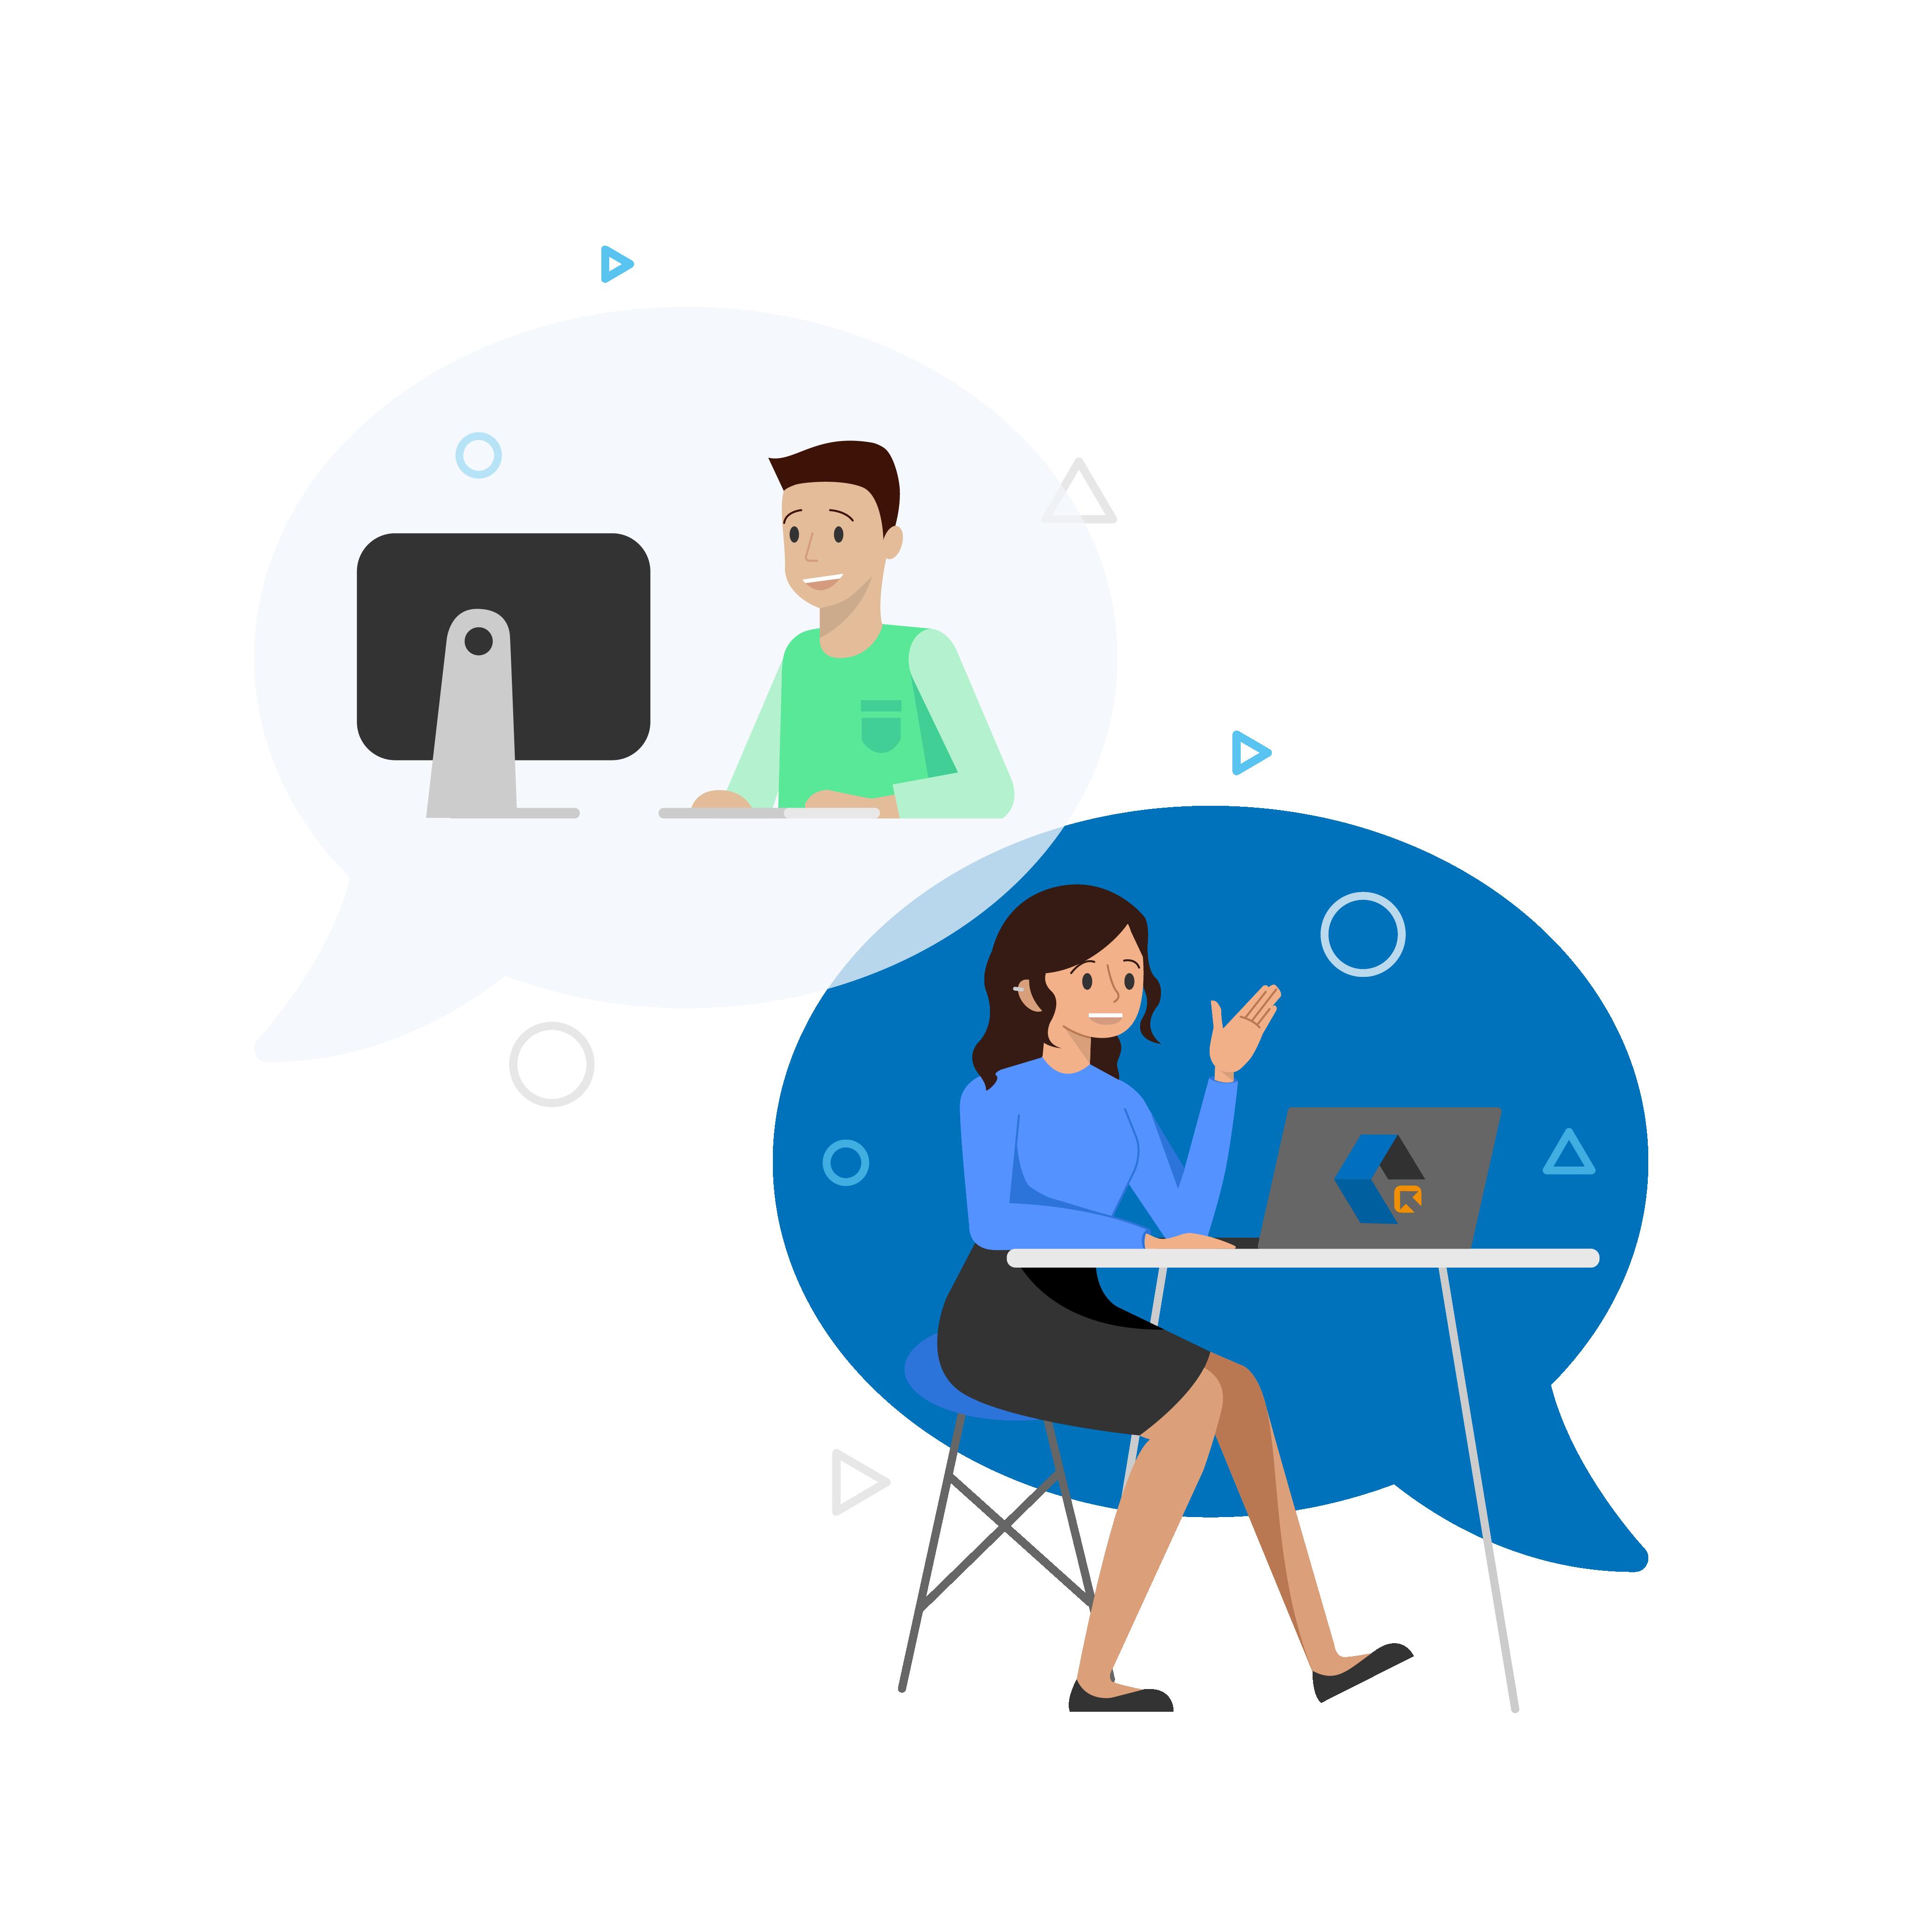 User having a conversation with a representative of ClickShip